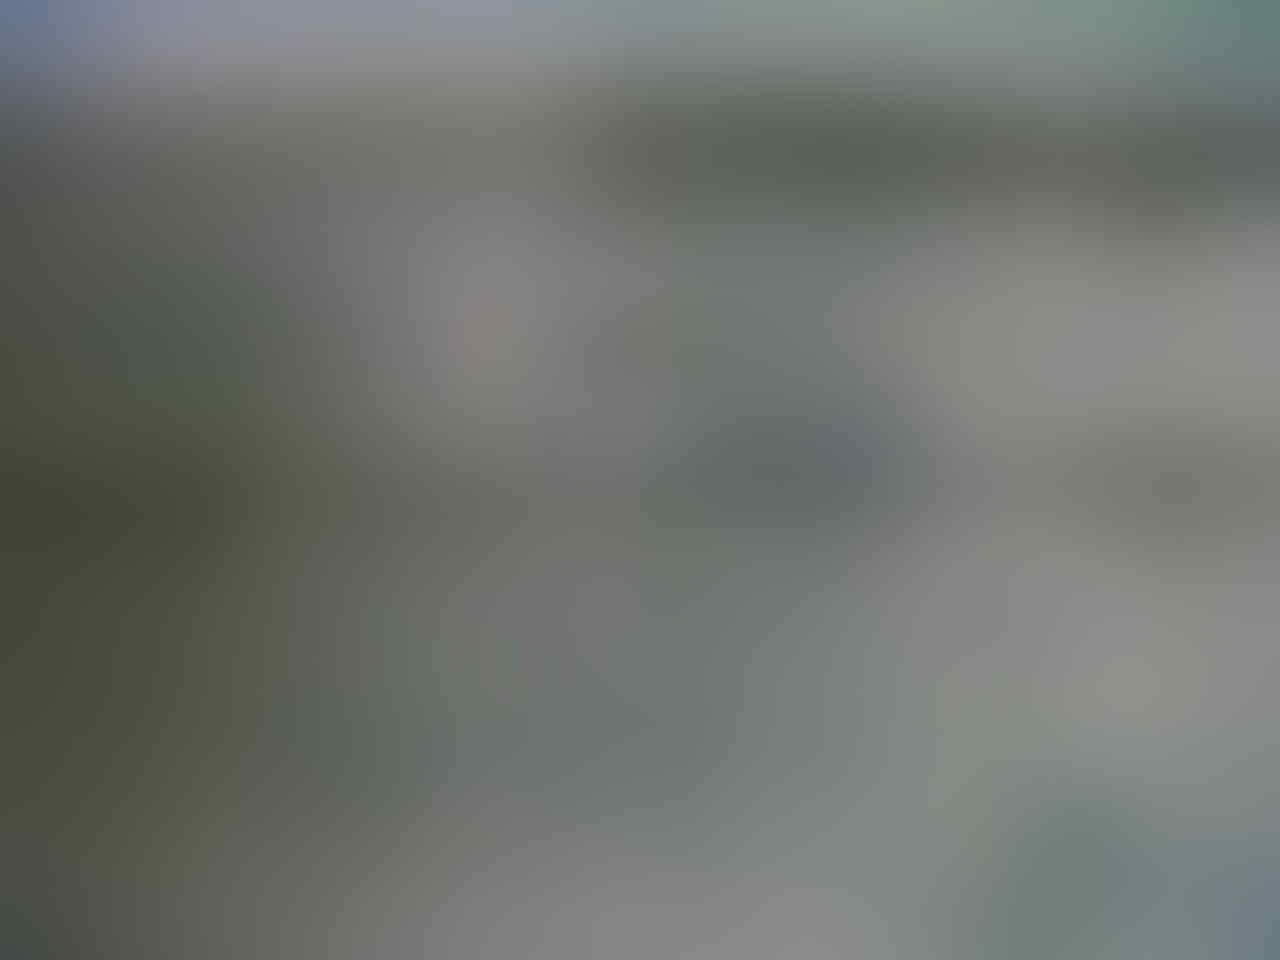 android sony xperia x10 mini pro ex cewe (bandung)